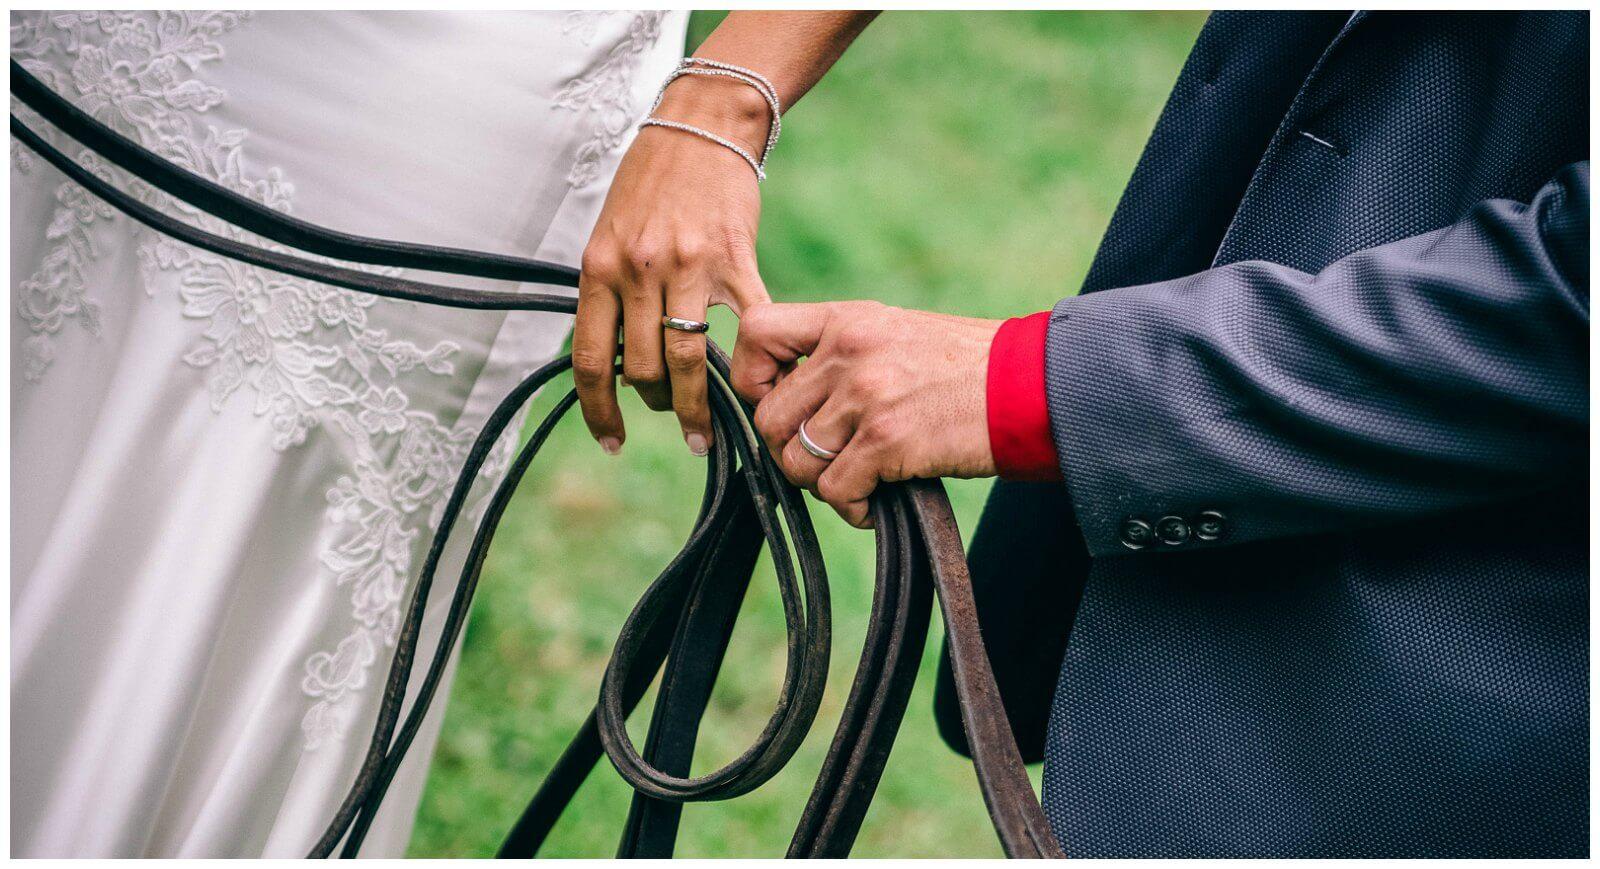 matrimonio gazebo jim grosio: gli sposi